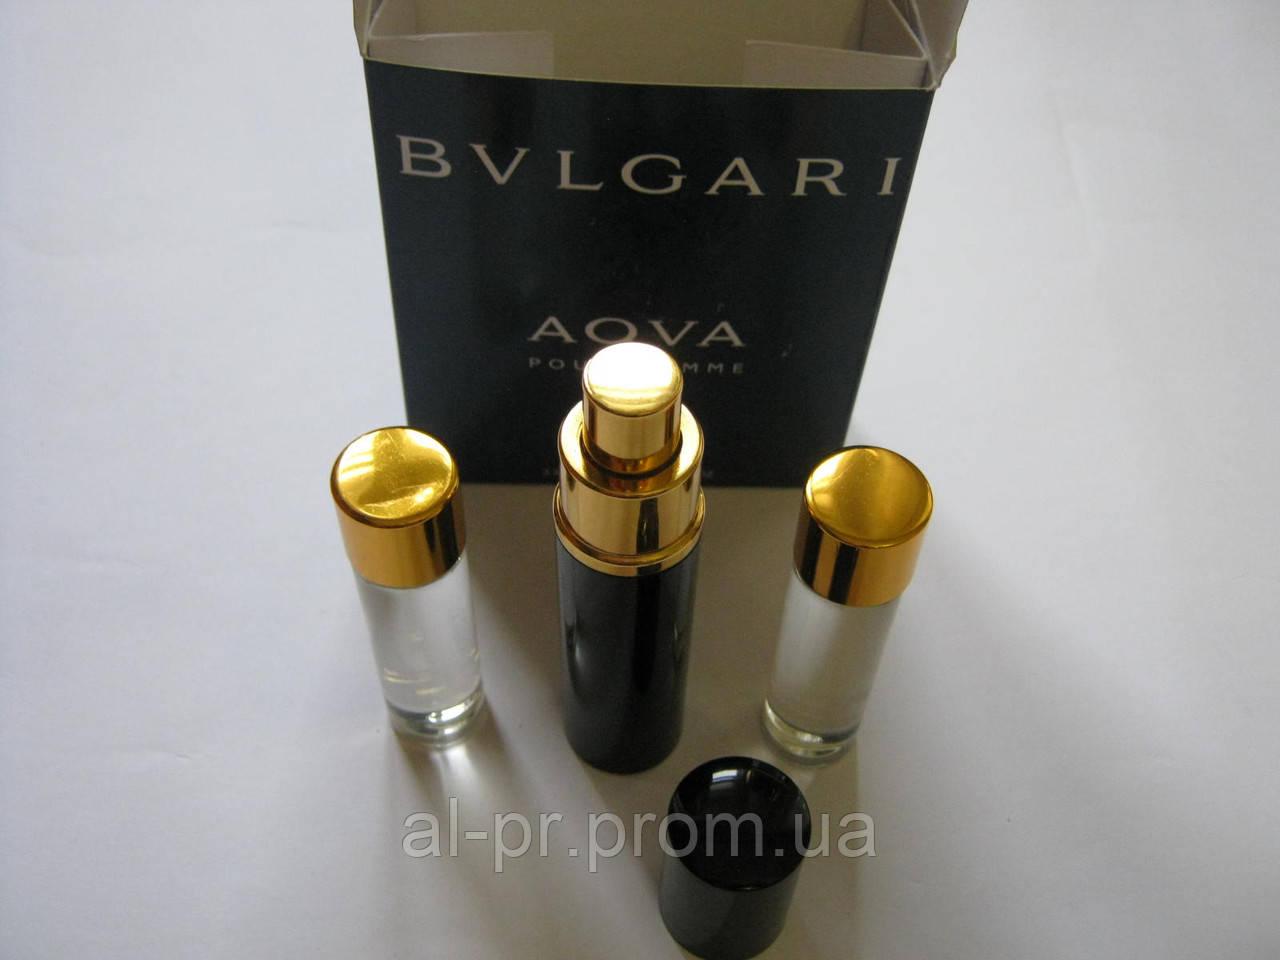 Набор парфюмерии Bvlgari Aqva Pour Homme